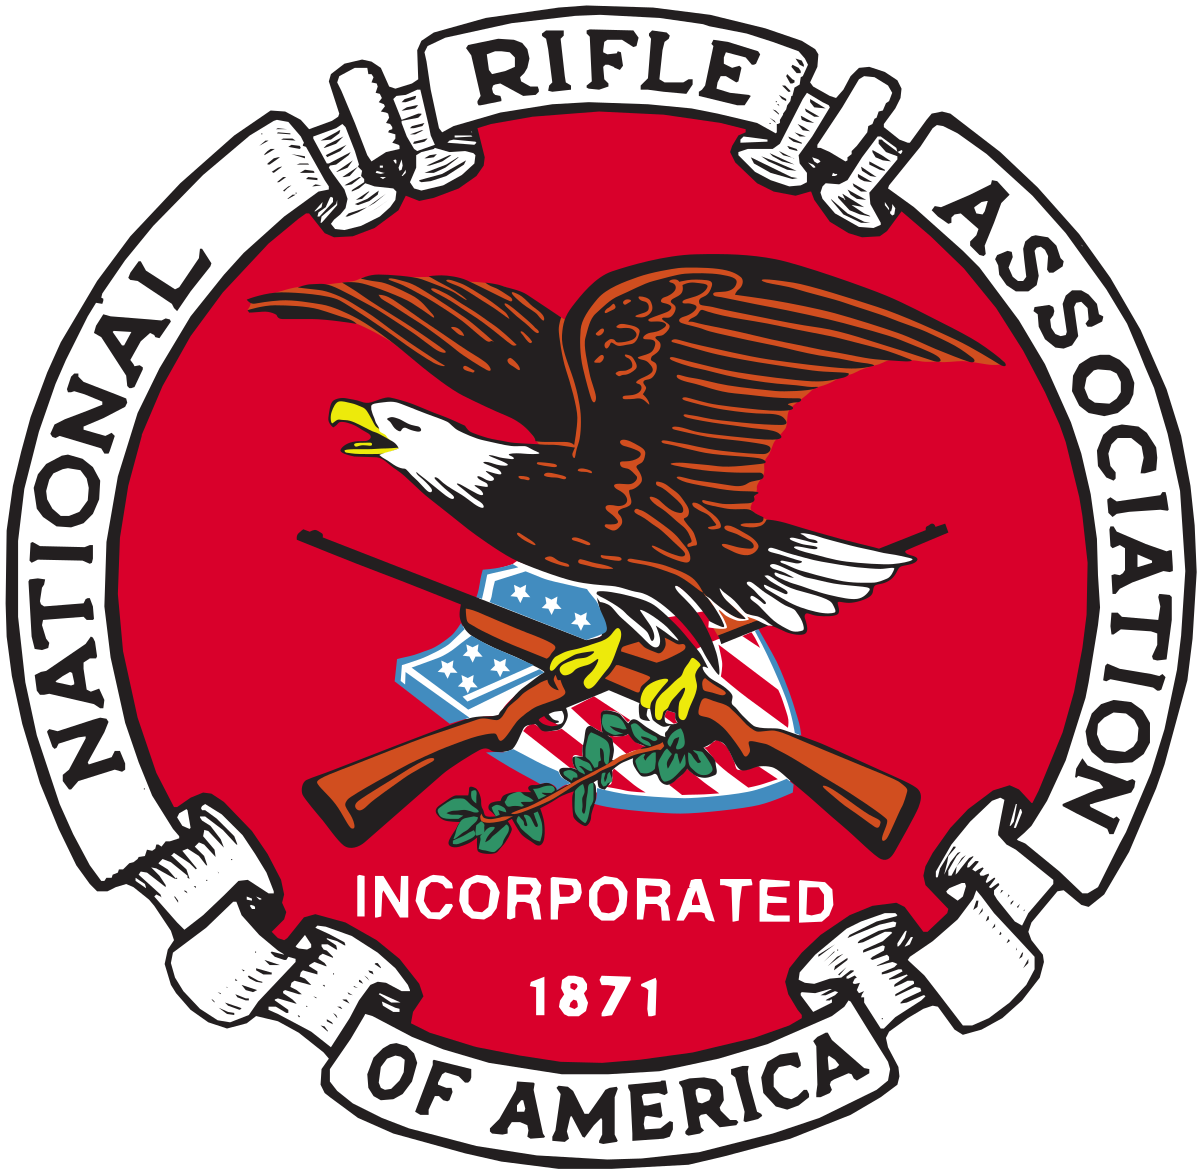 National rifle association wikipedia. Explorer clipart louisiana early